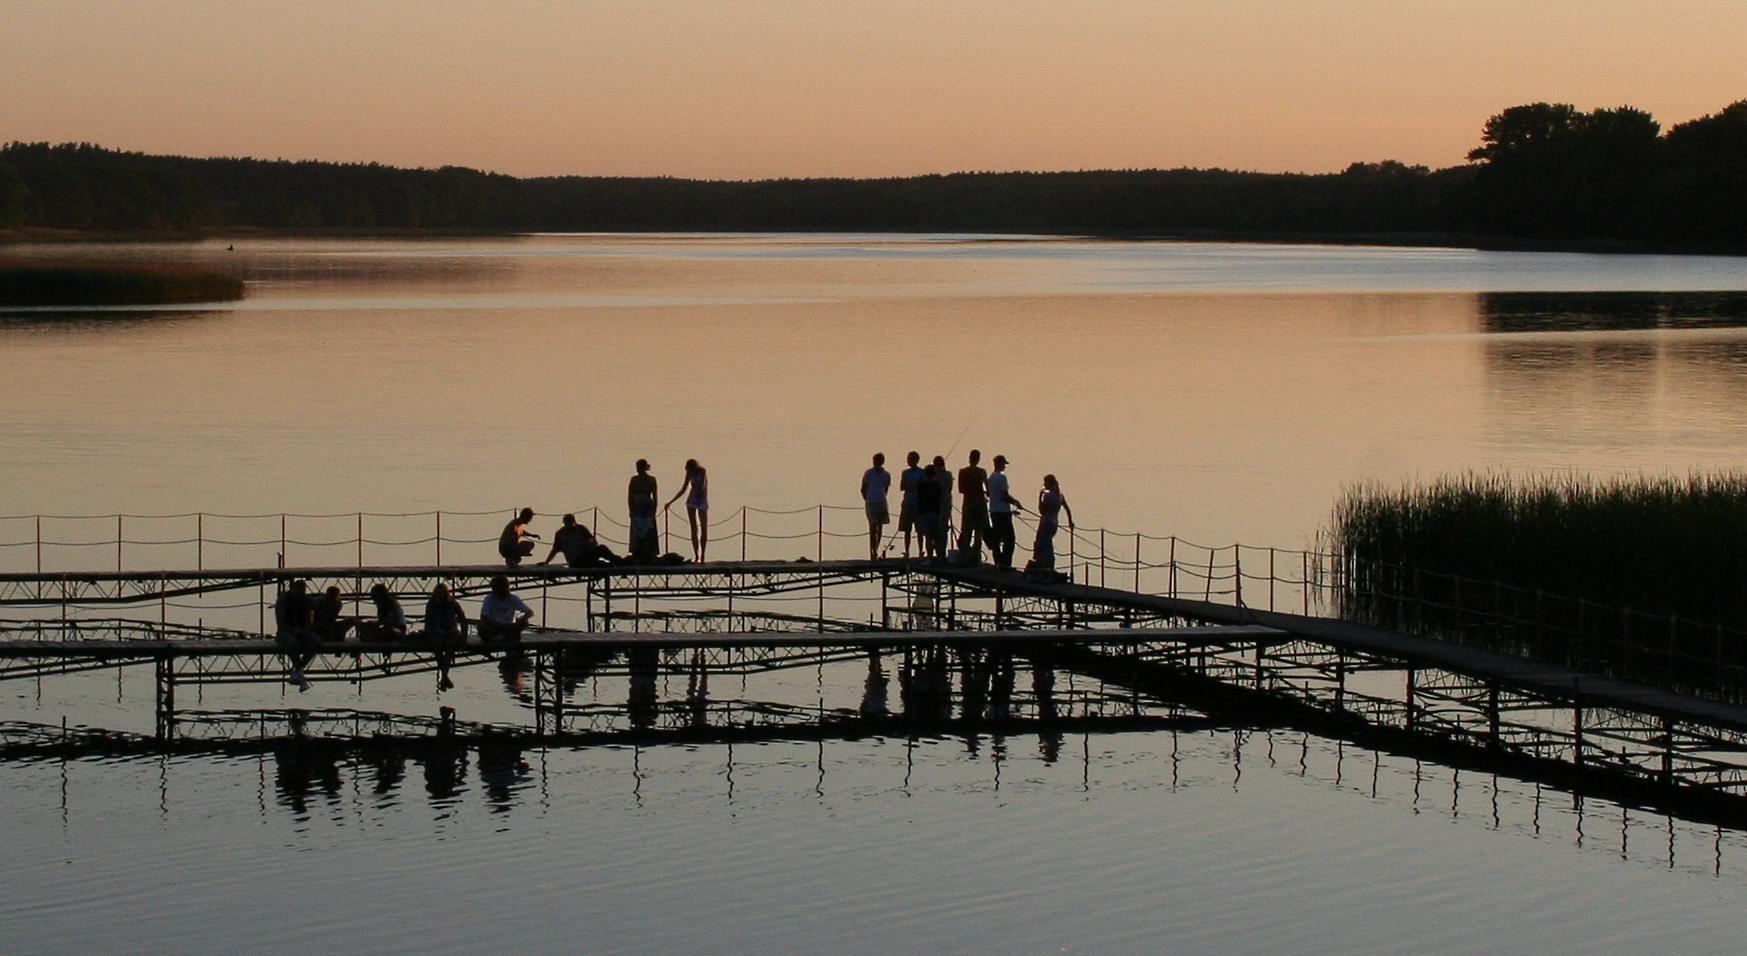 Jugendtreff am See